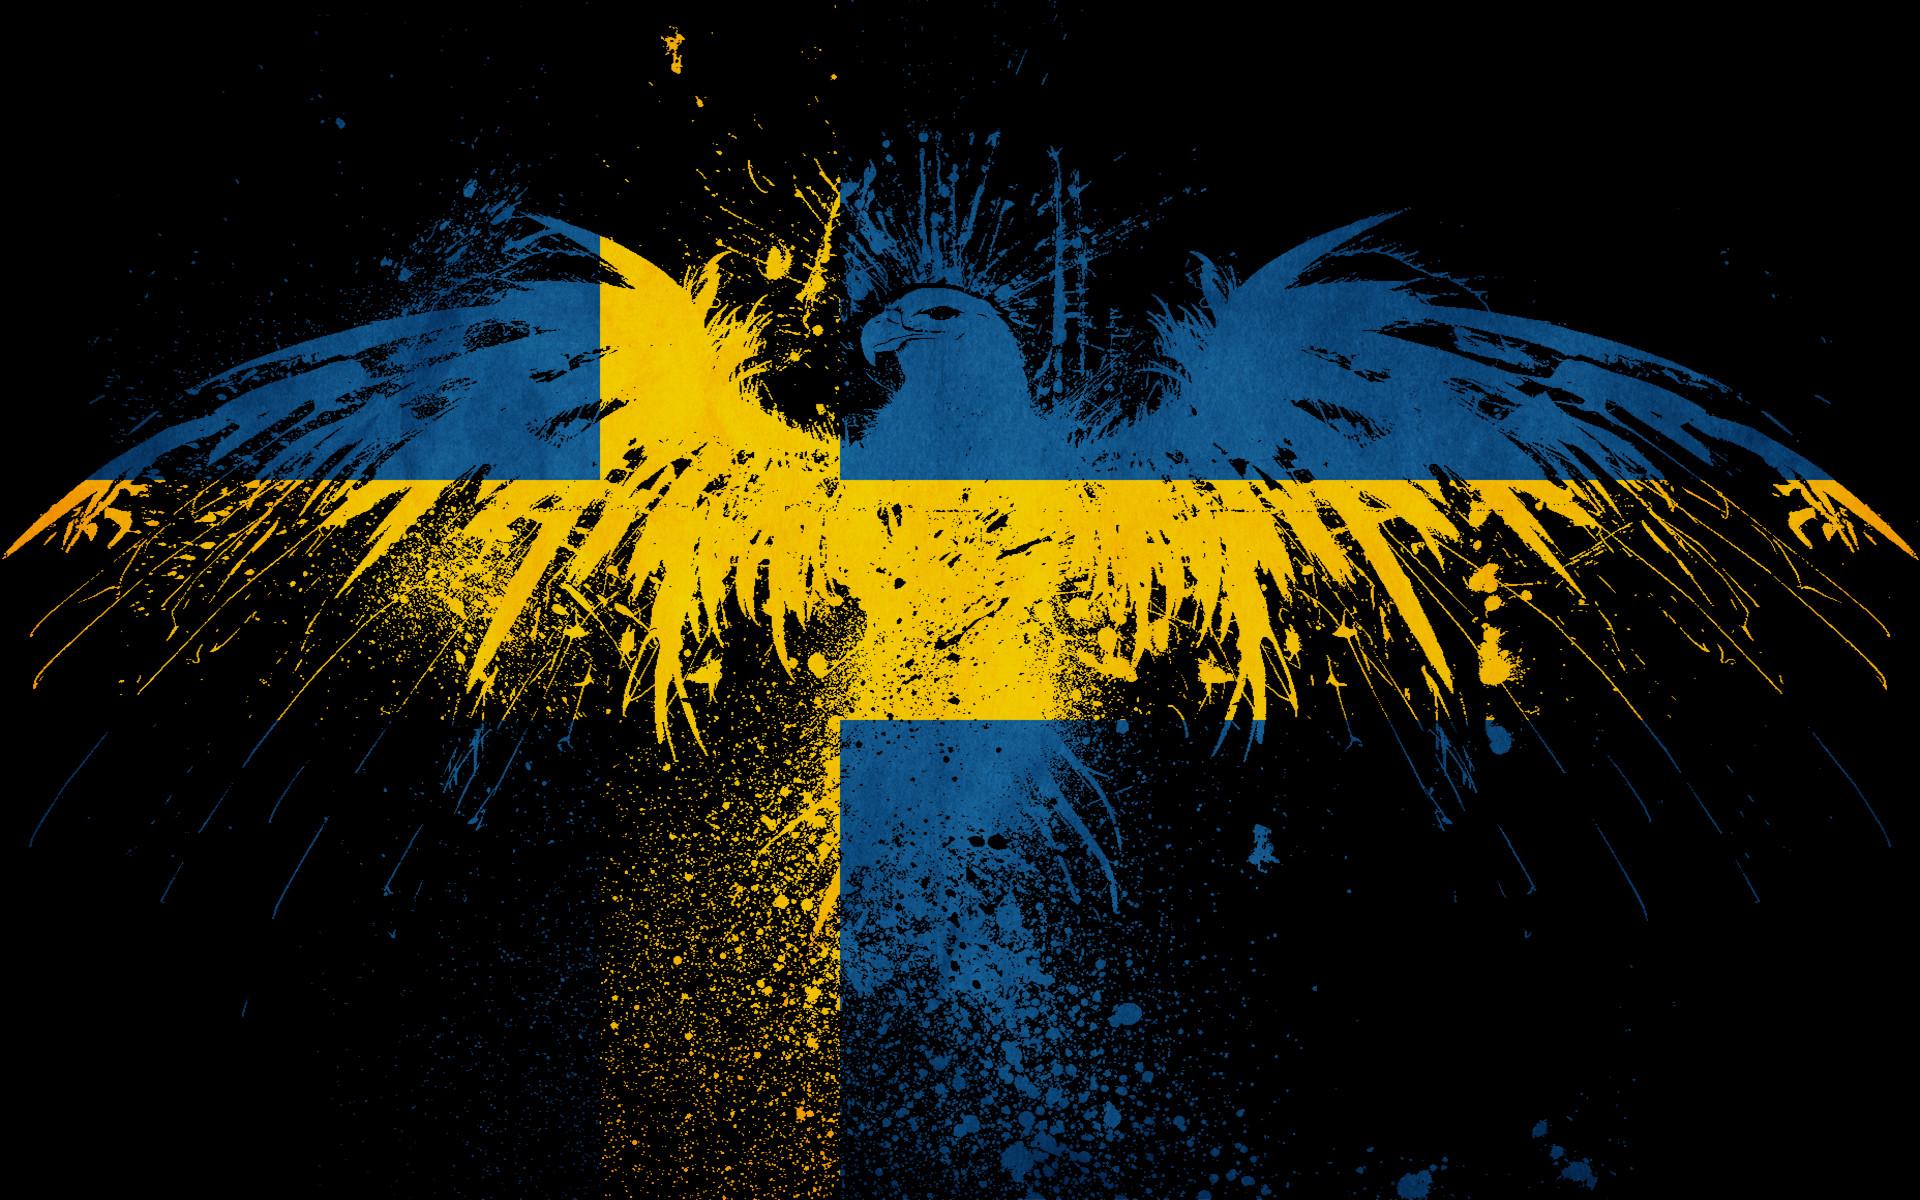 Swedish Wallpaper HD Wallpapers Download Free Images Wallpaper [1000image.com]